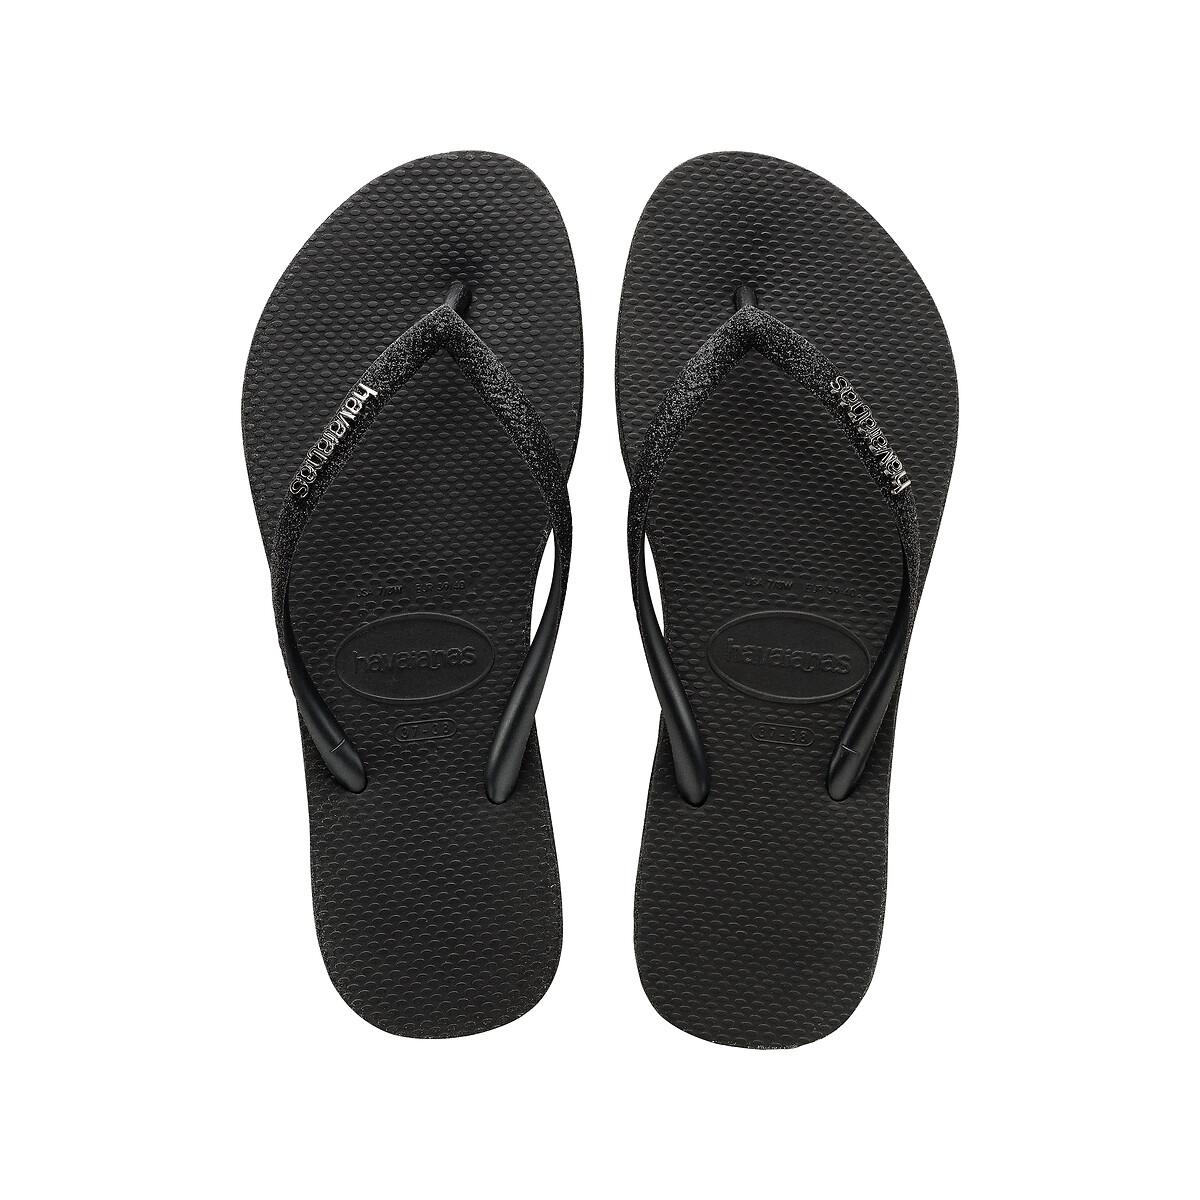 Havaianas Slipper women slim sparkle black-schoenmaat 39 40 online kopen